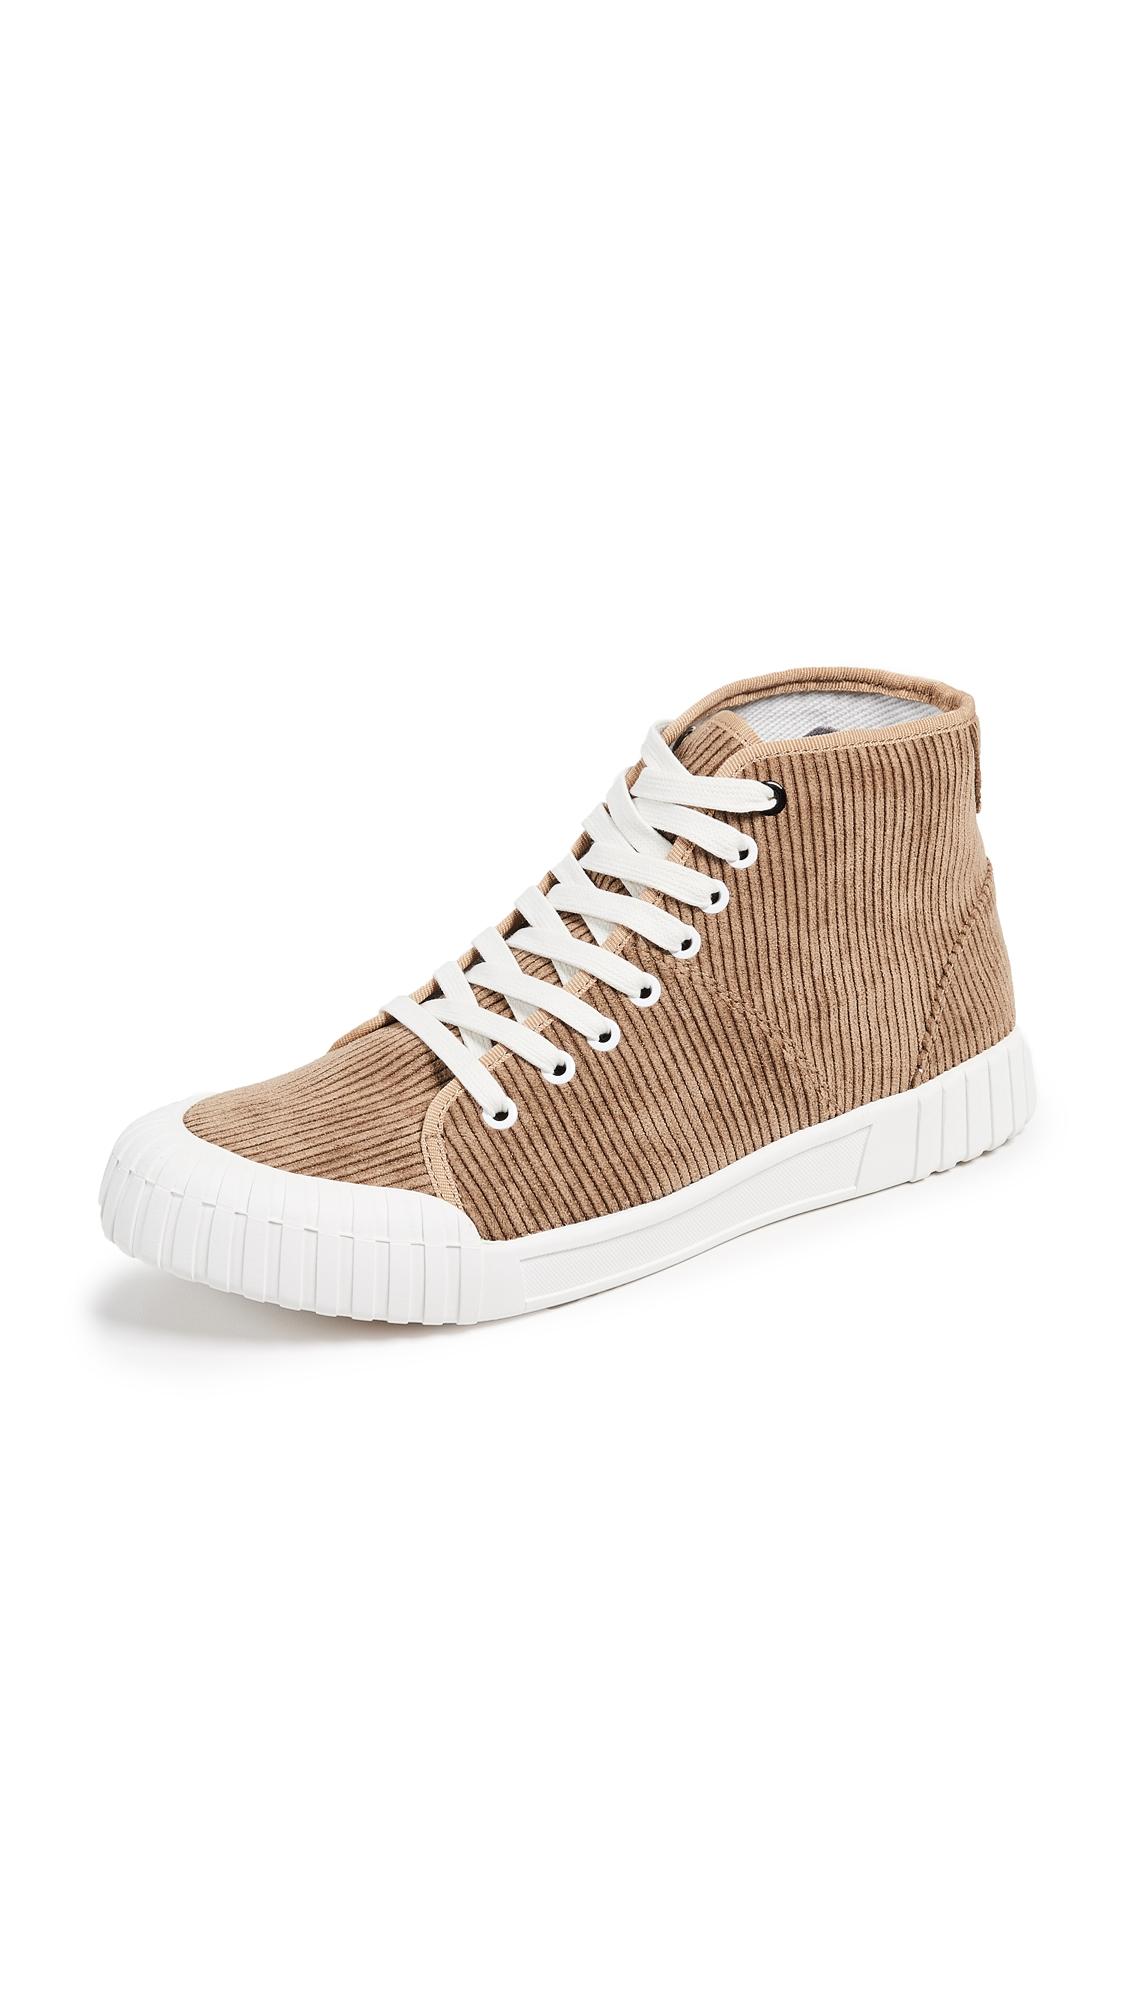 GOOD NEWS Rhubarb High Top Sneakers in Tan